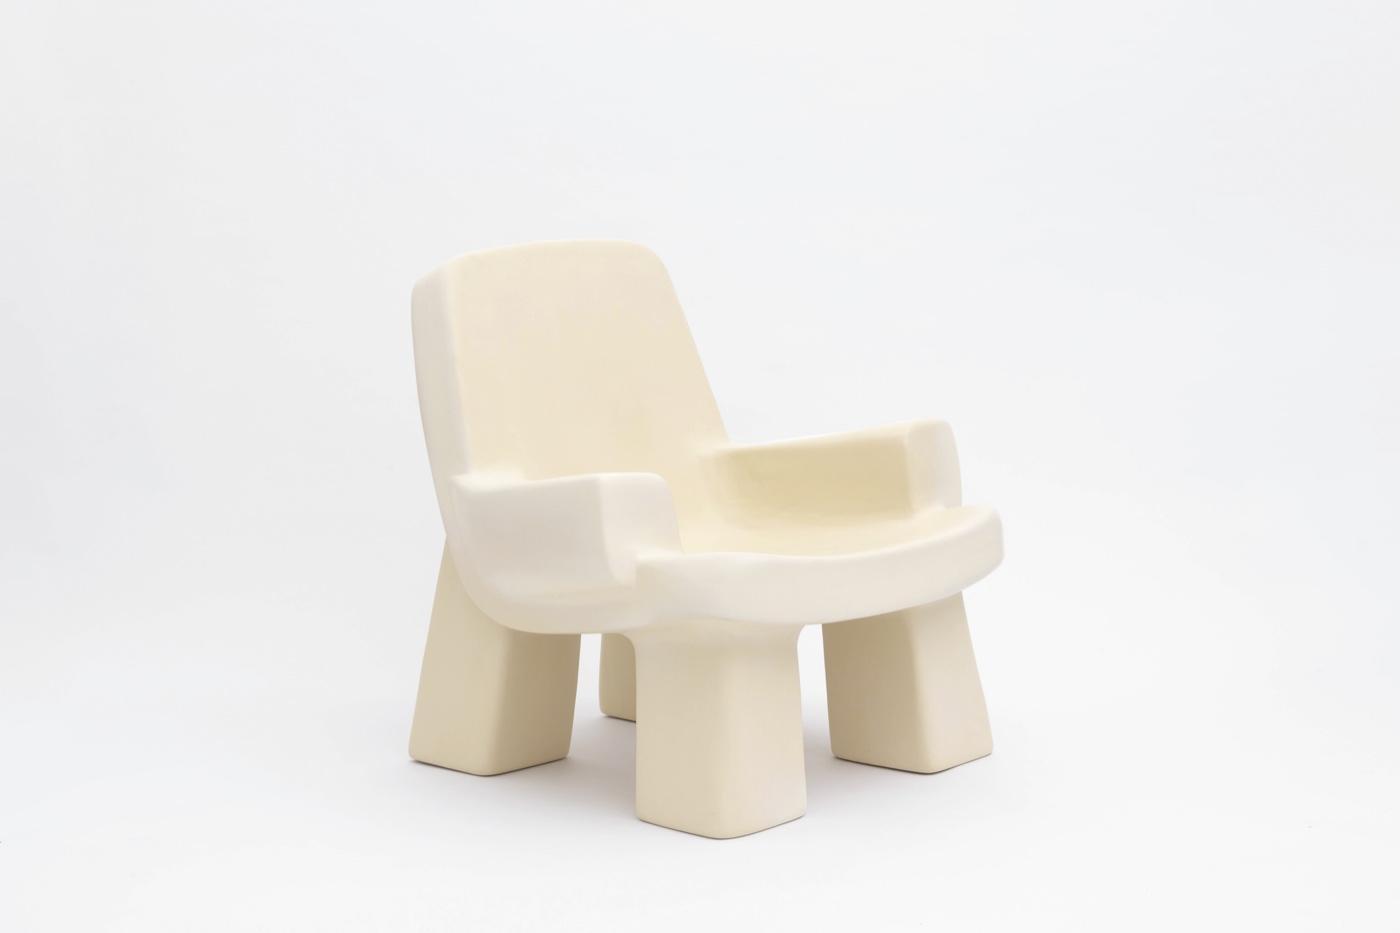 Sculptural Furniture-Image-1